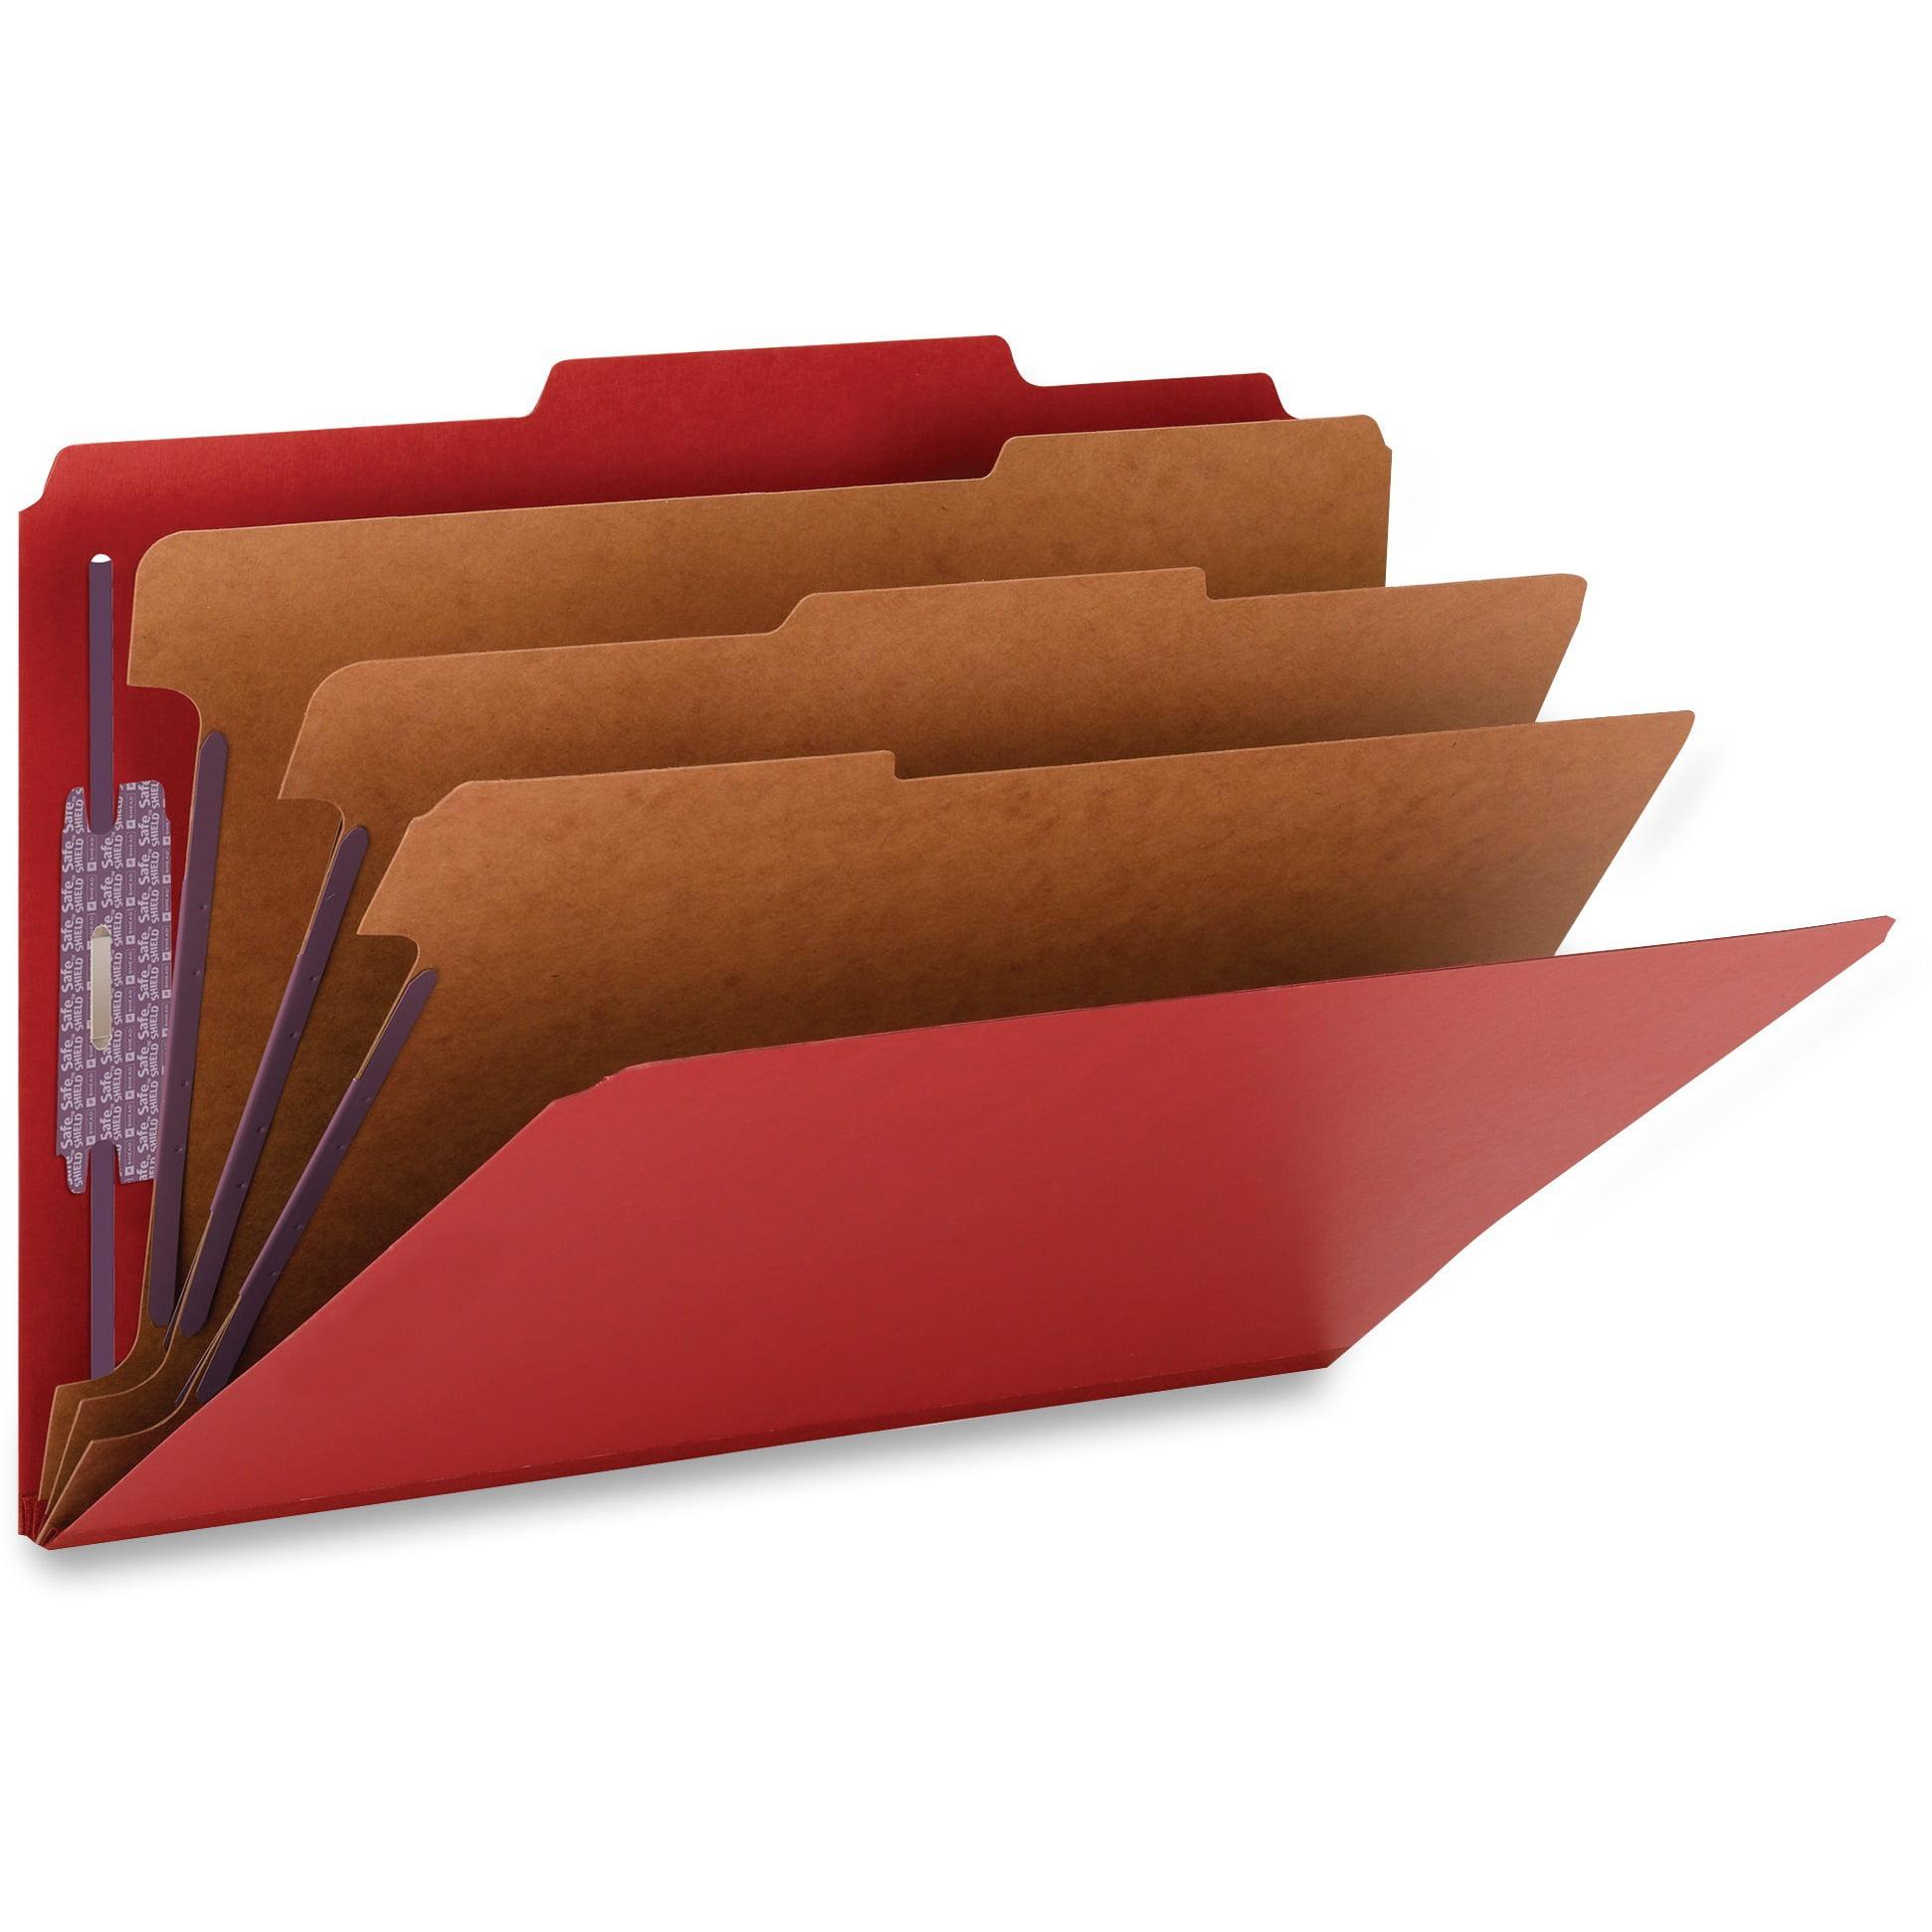 Smead, SMD19095, SafeSHIELD Fasteners 3-Div Classification Folders, 10 / Box, Bright Red